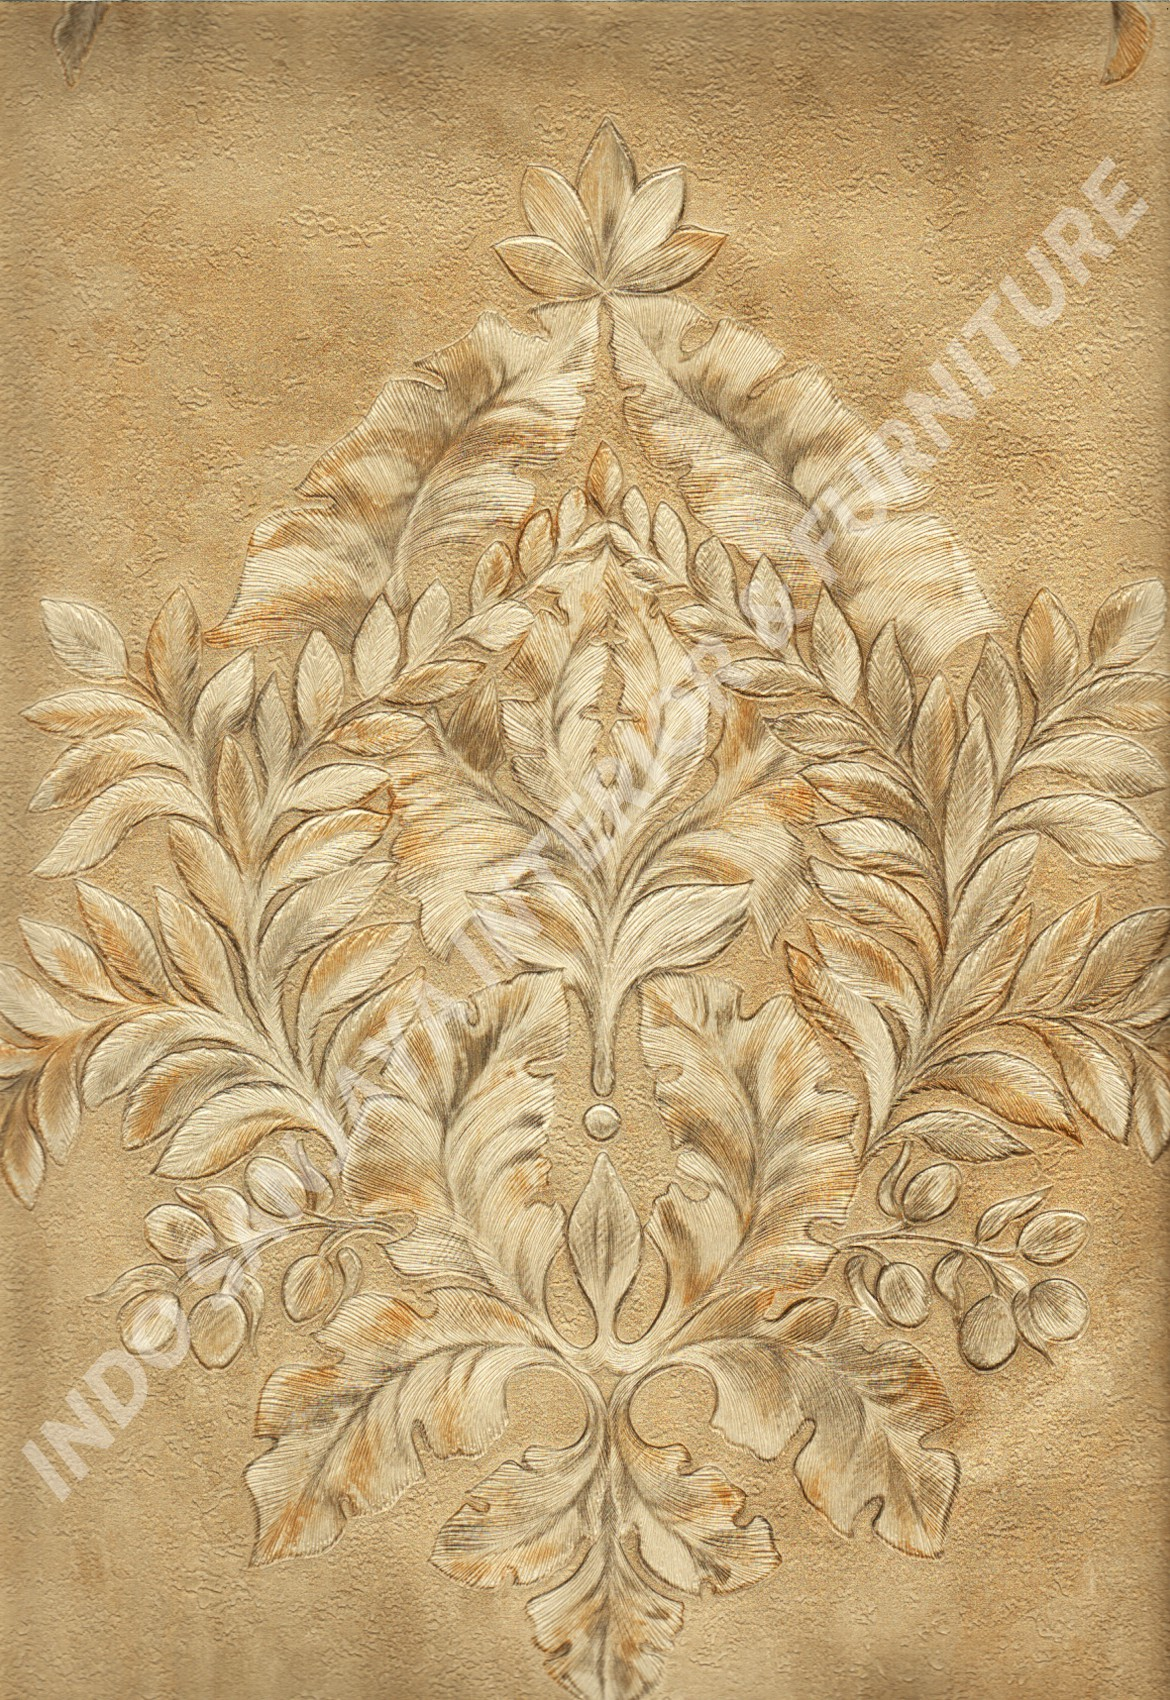 wallpaper   Wallpaper Klasik Batik (Damask) YG70104:YG70104 corak  warna